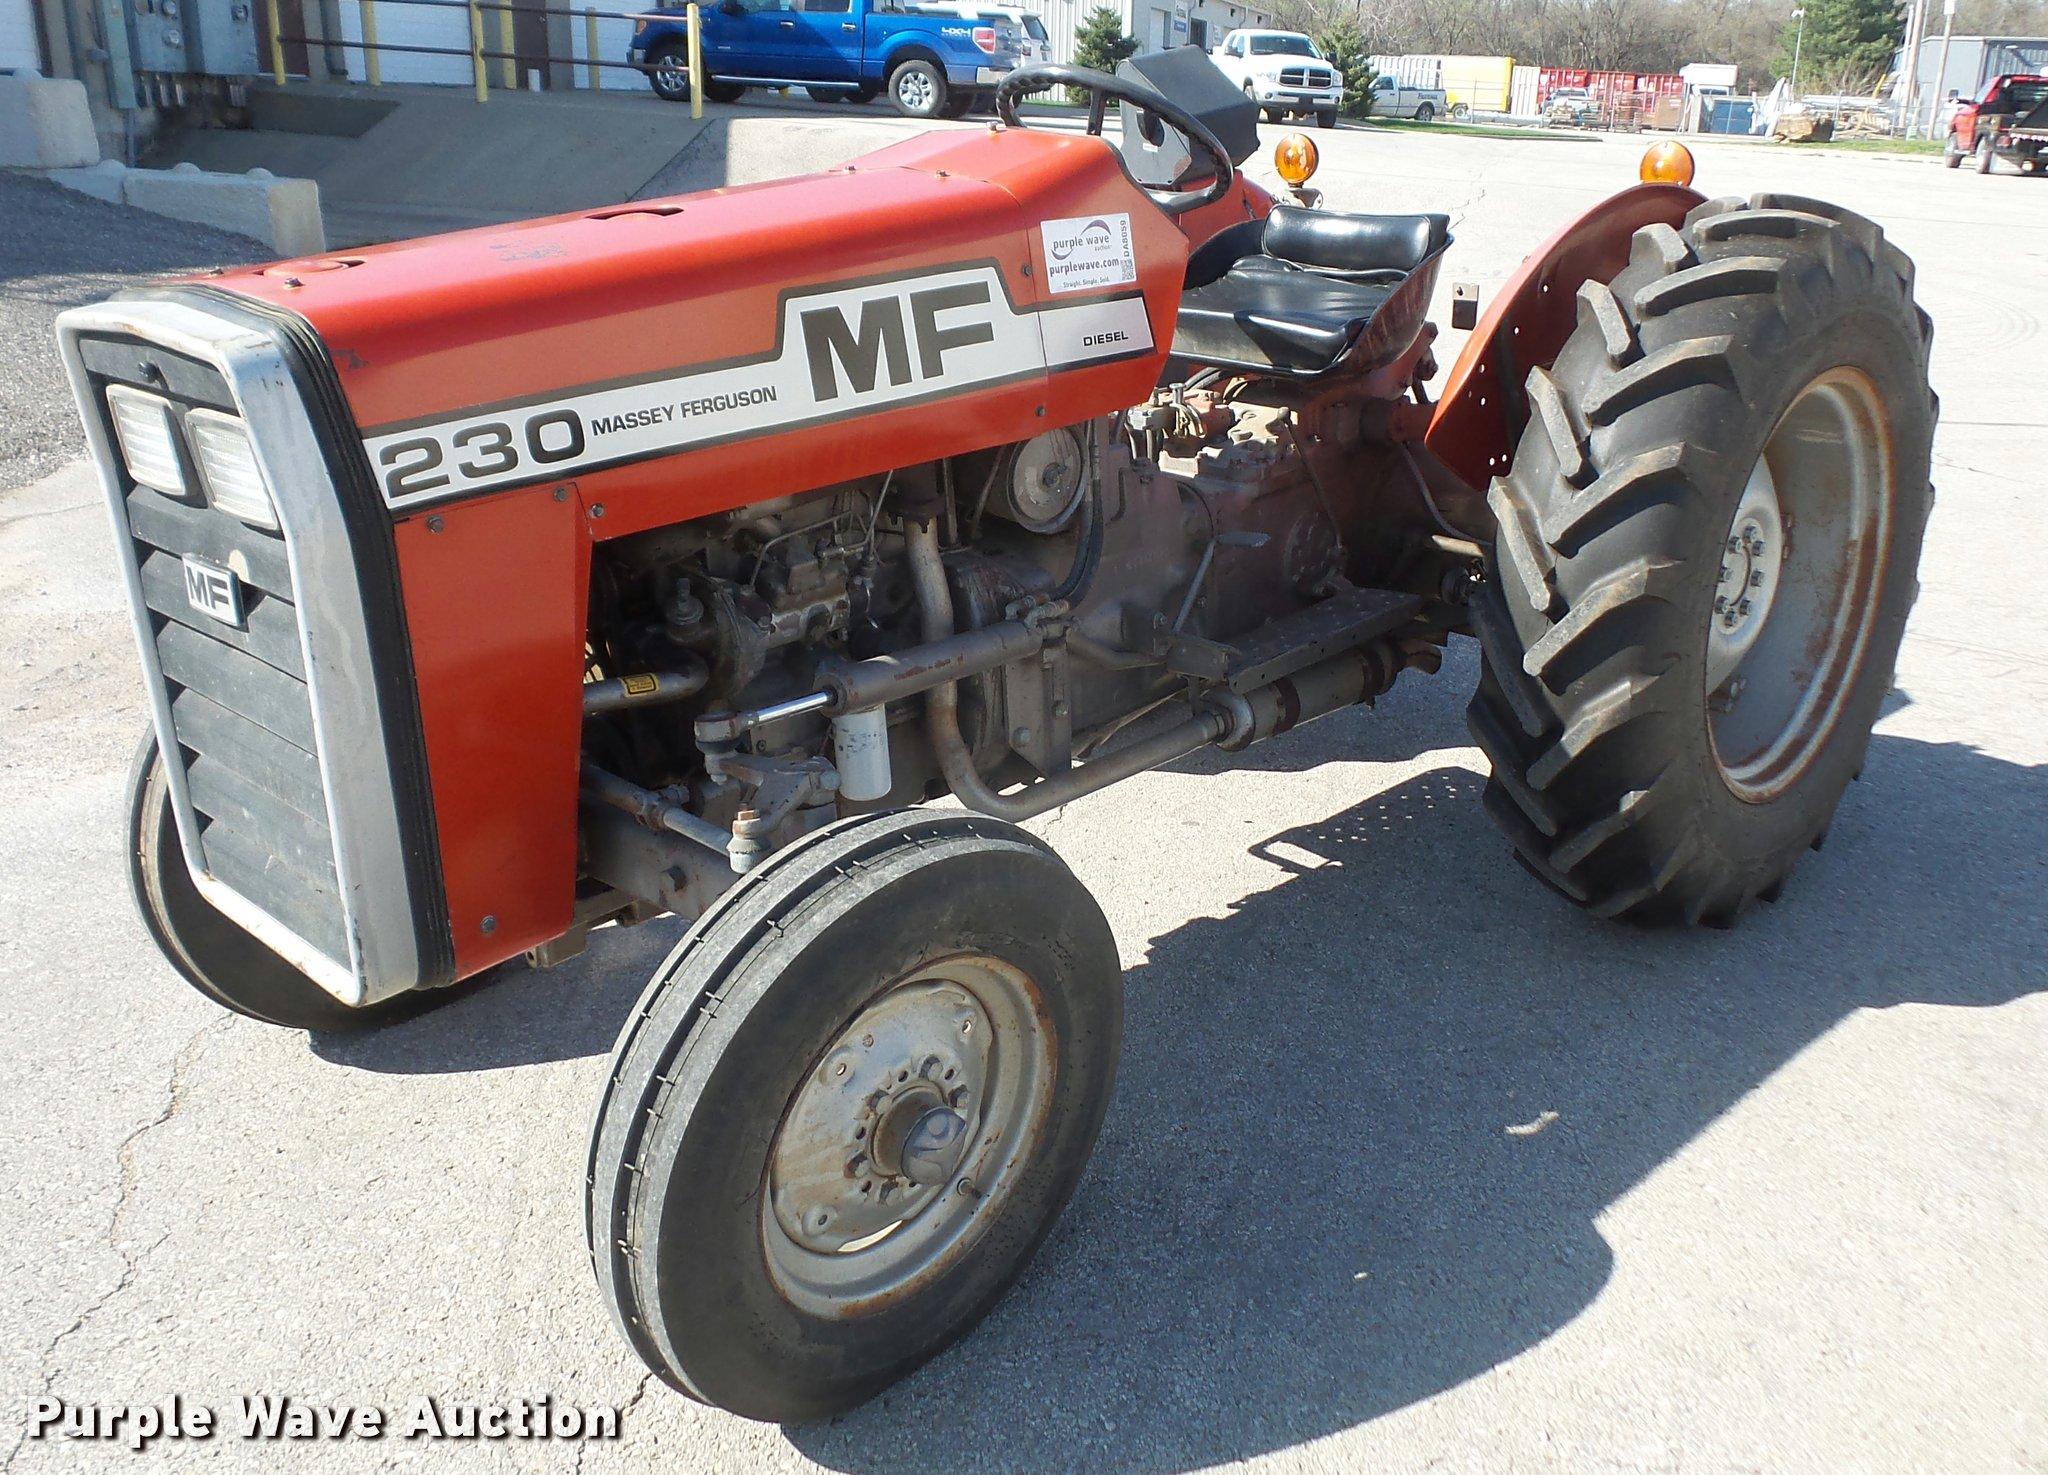 DA8059 image for item DA8059 1982 Massey-Ferguson 230 tractor